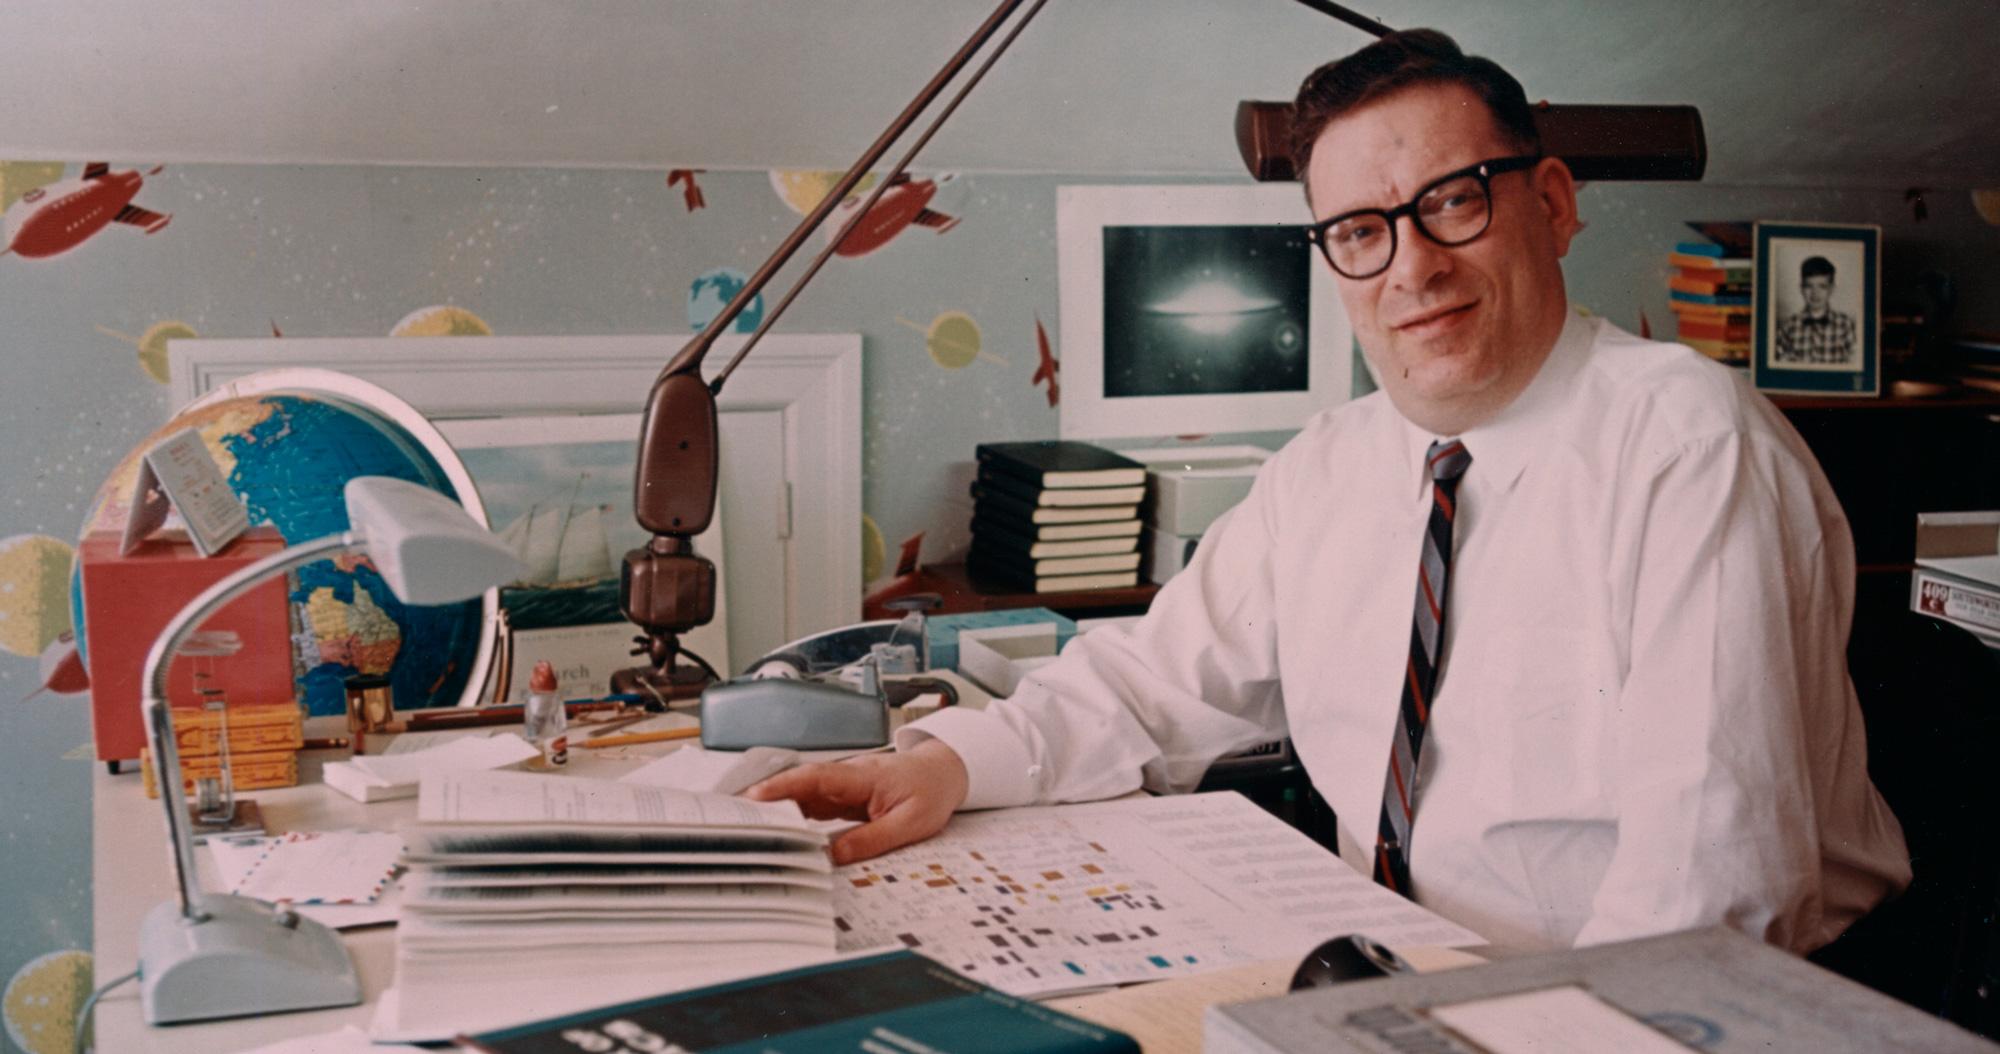 Foundation's Edge – Isaac Asimov